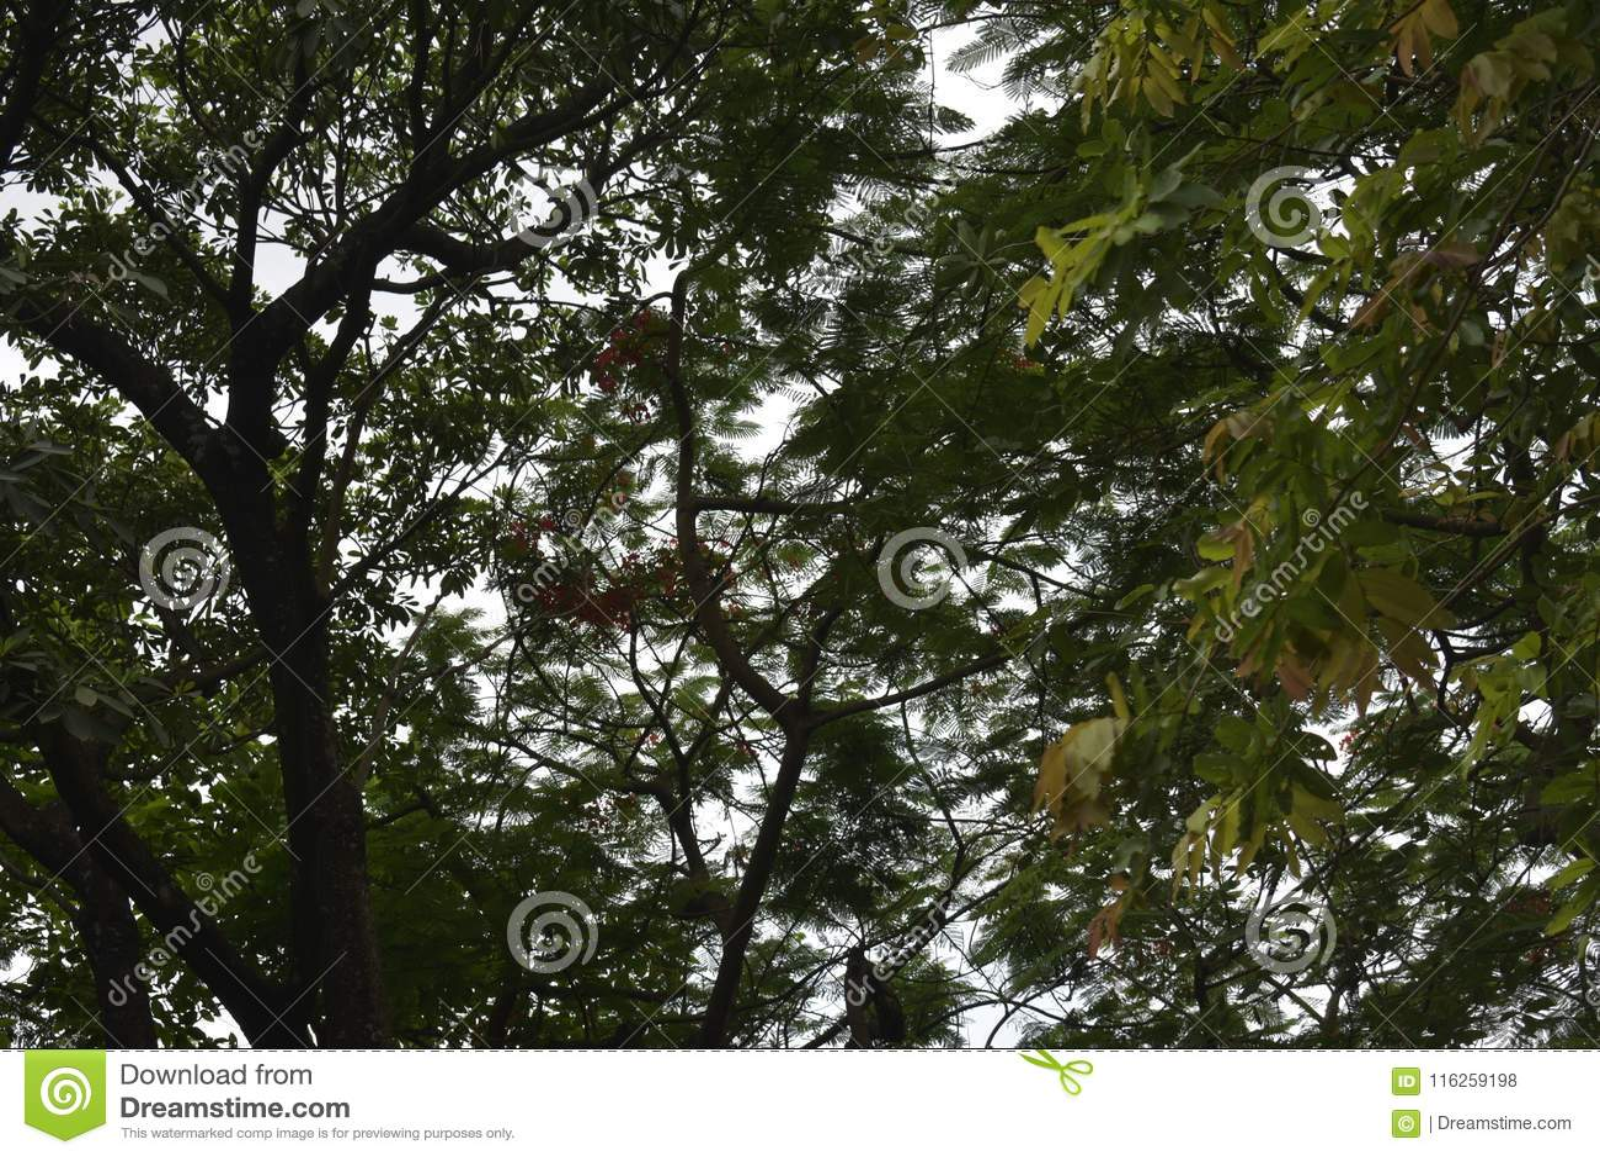 Baum Blätter Stock Images - Download 353 Photos